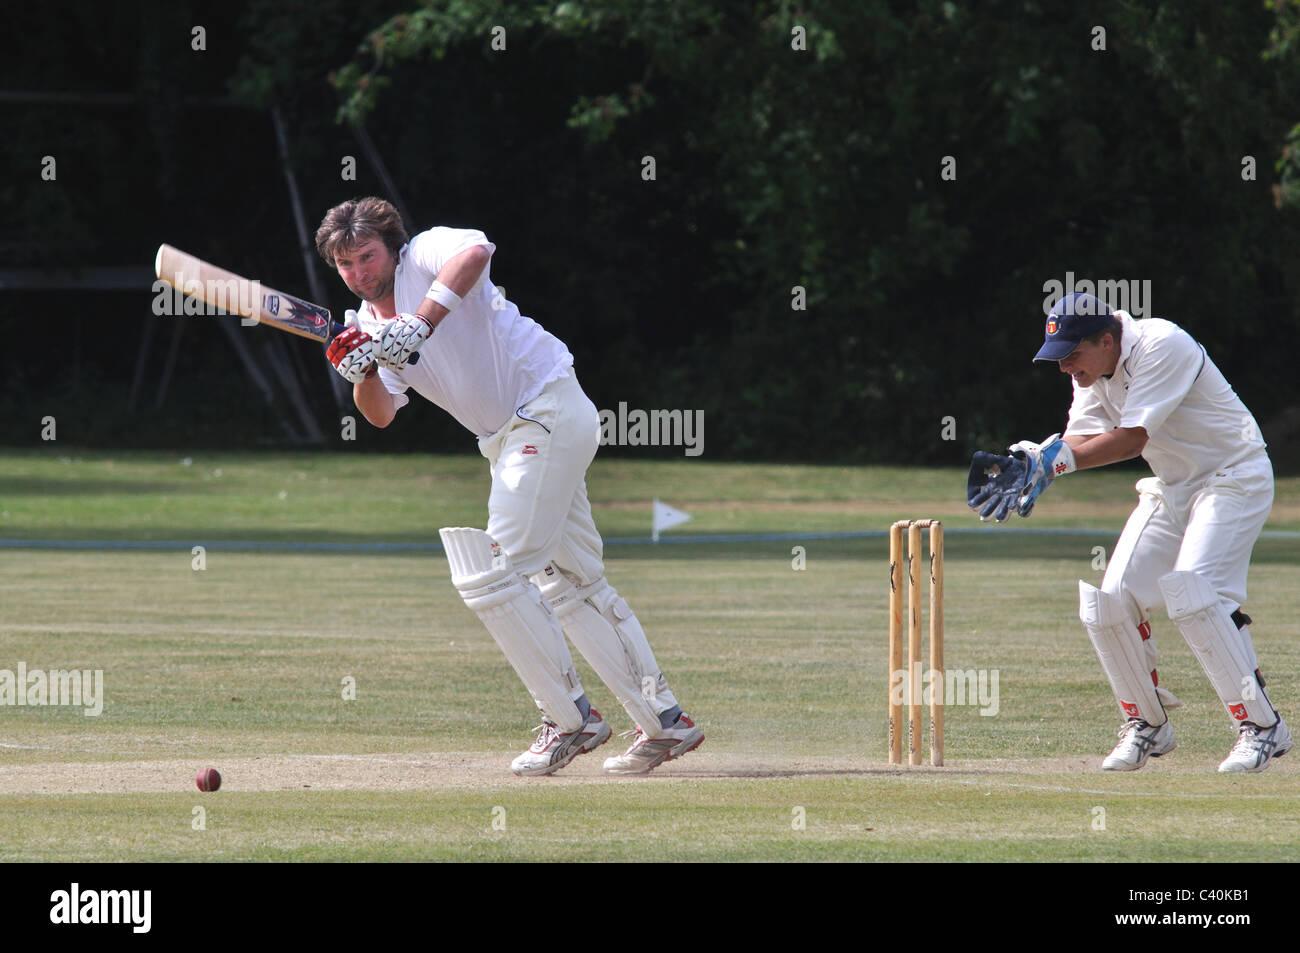 Village cricket at Norton Lindsey, Warwickshire, England, UK - Stock Image